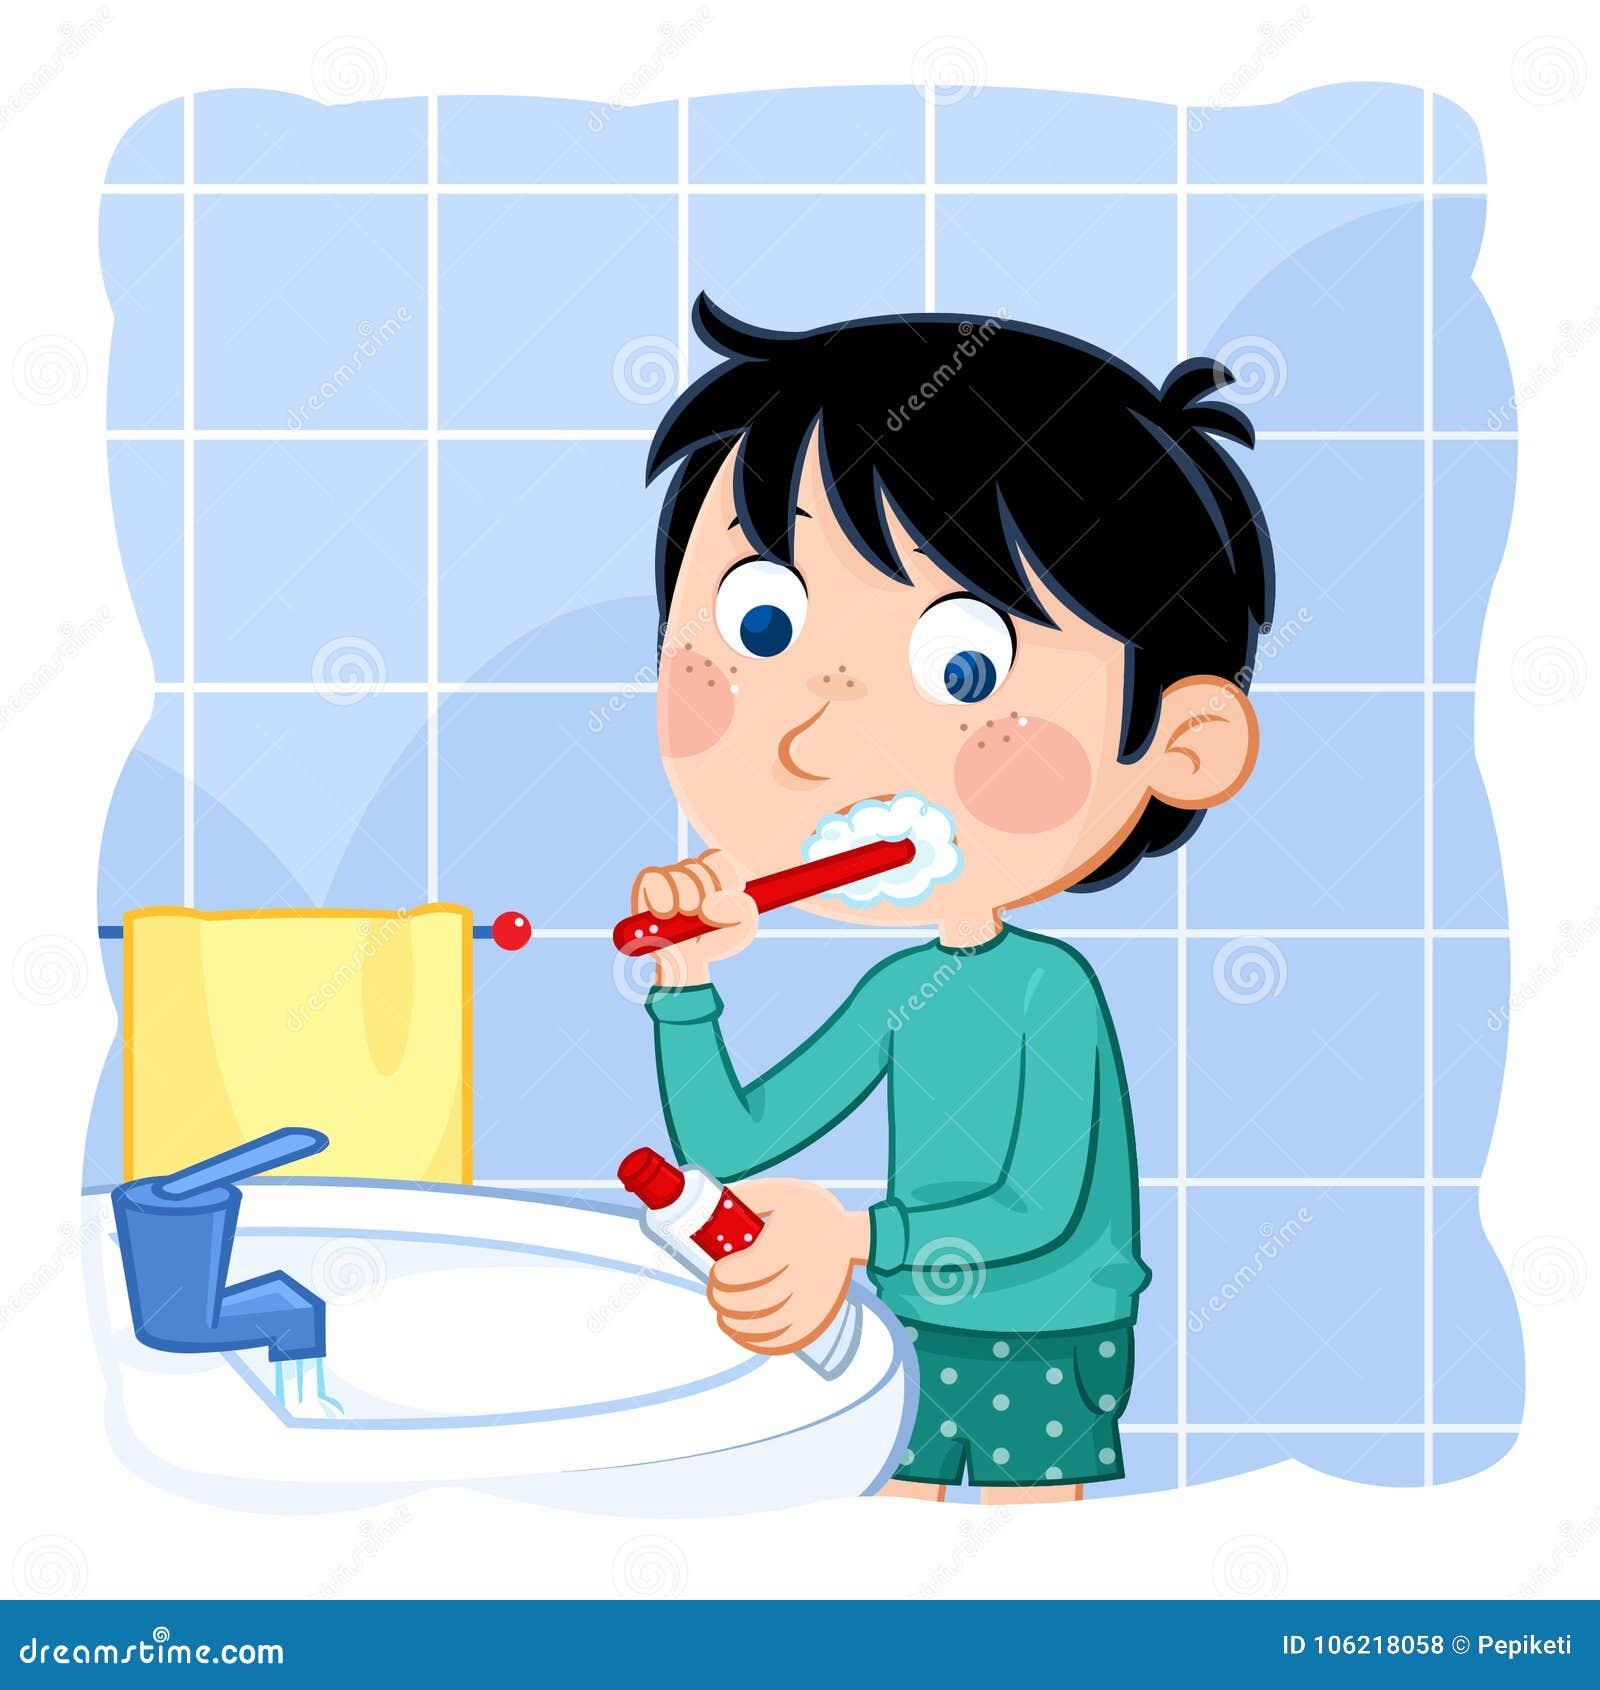 Hygiene Cute Kid Brushing His Teeth In The Bathroom Stock Illustration Illustration Of Cute Happy 106218058